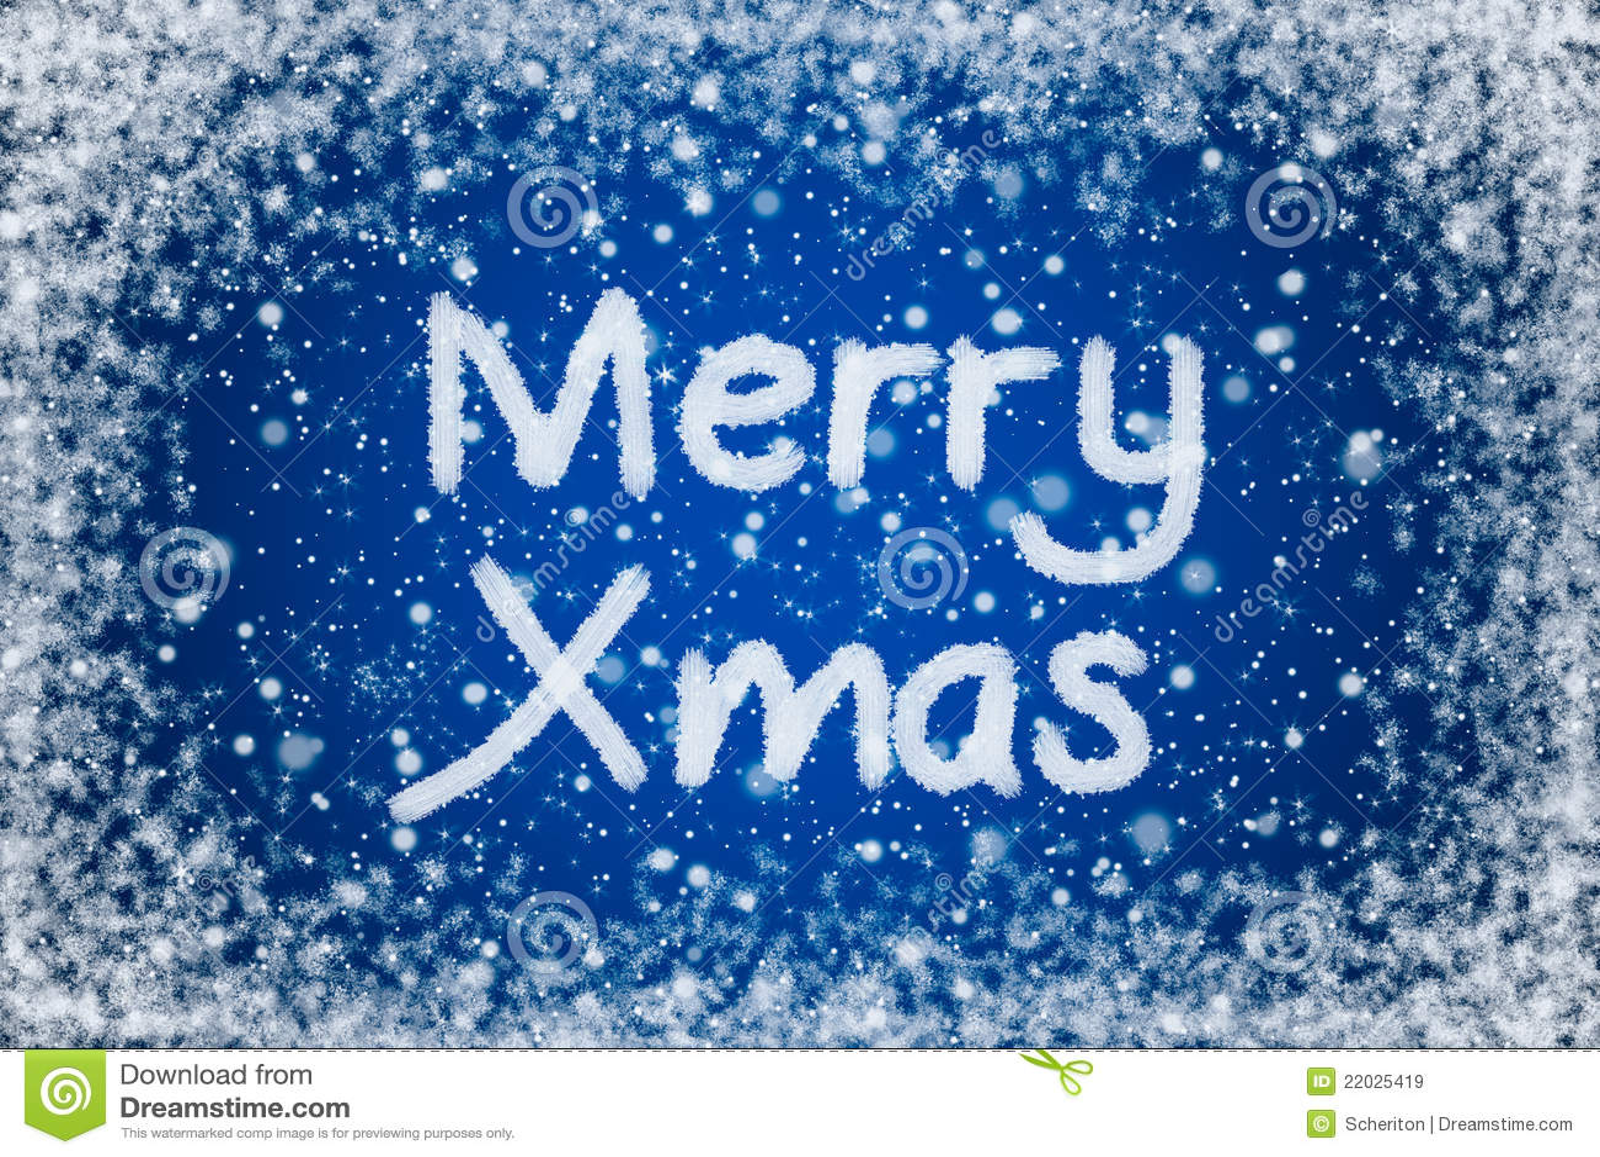 Merry Xmas On Christmas Blue Background Stock Illustration ...